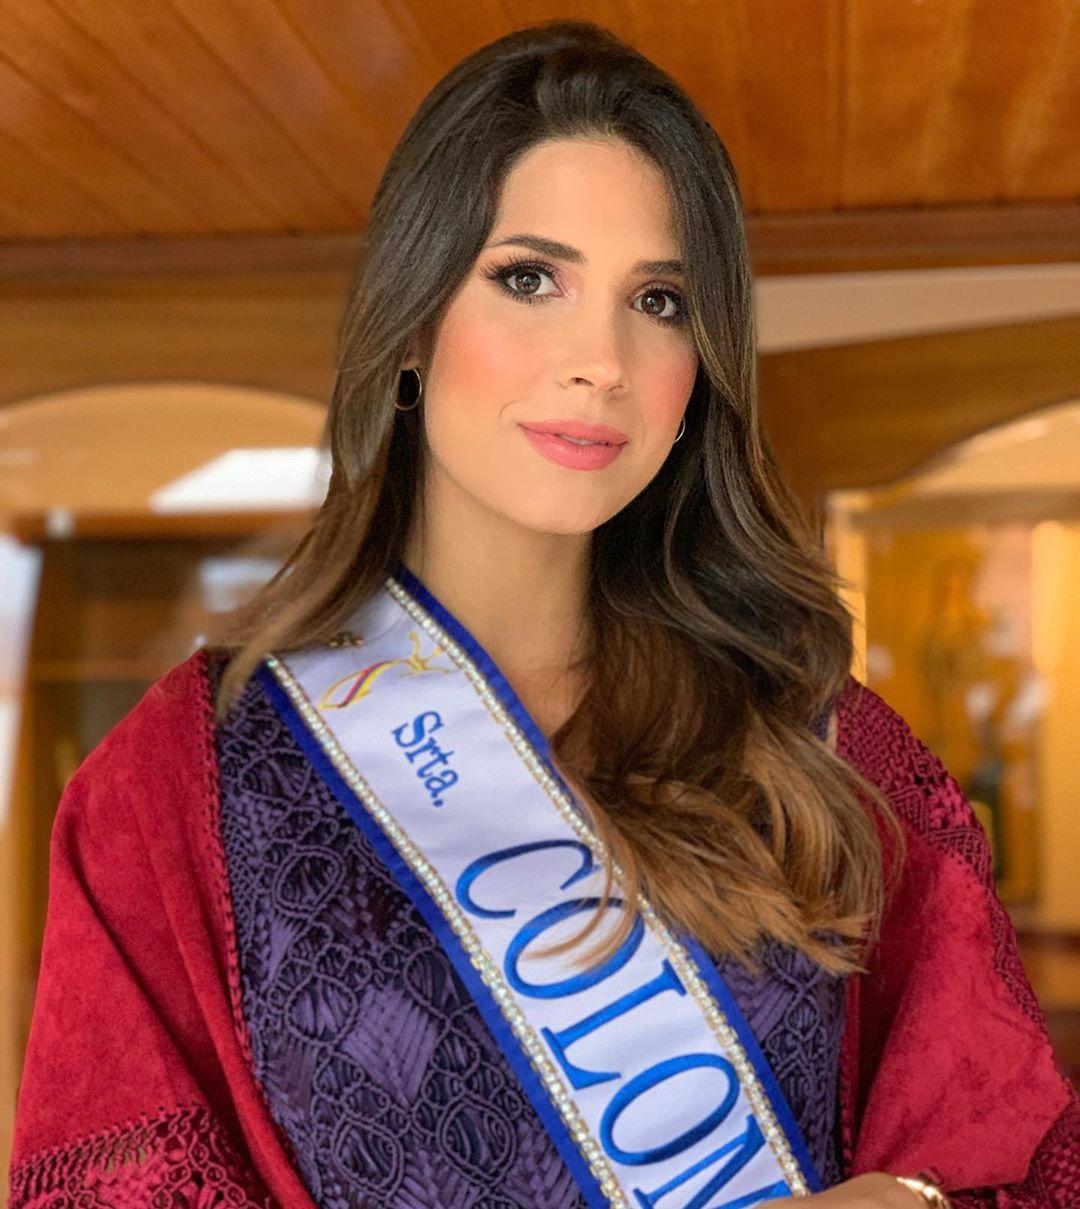 gabriela tafur, top 5 de miss universe 2019. - Página 5 67703710